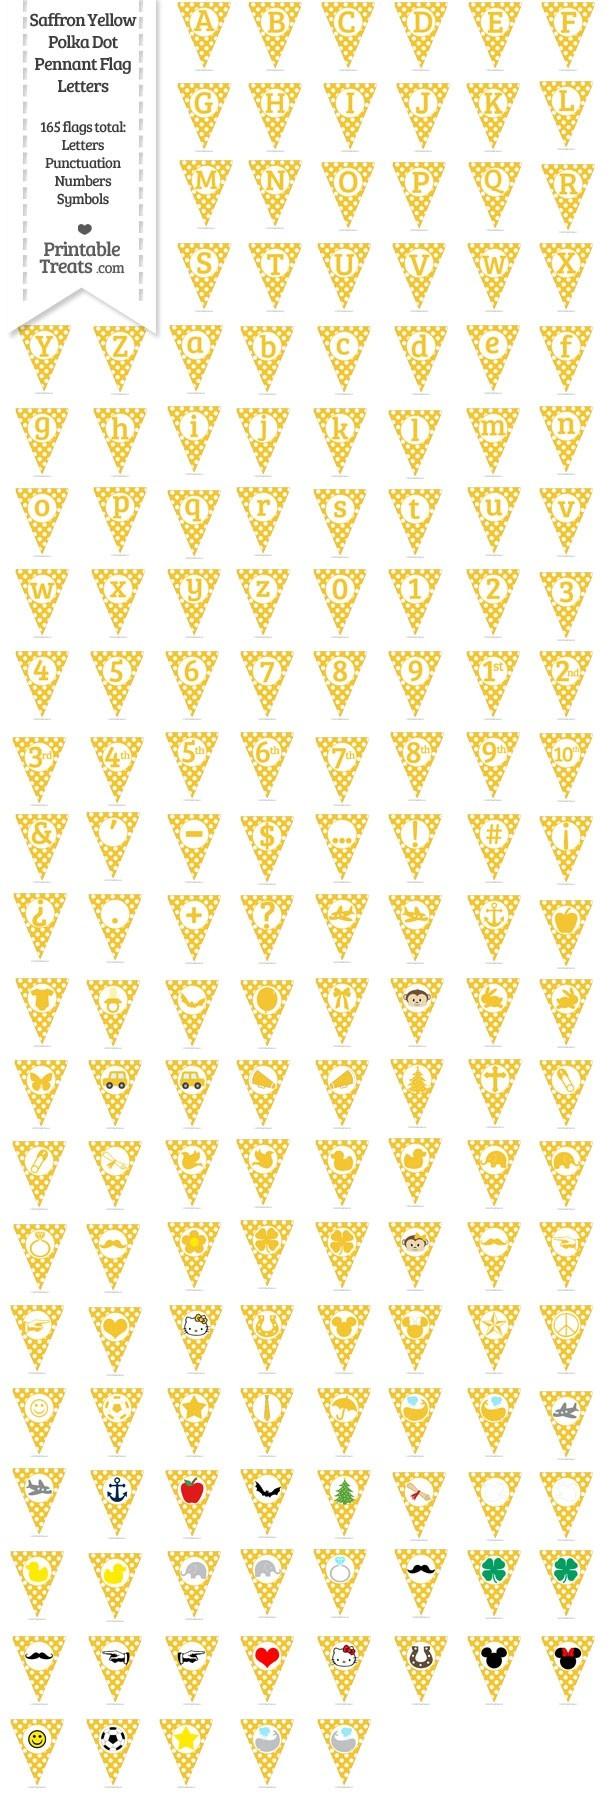 165 Saffron Yellow Polka Dot Pennant Flag Letters Password